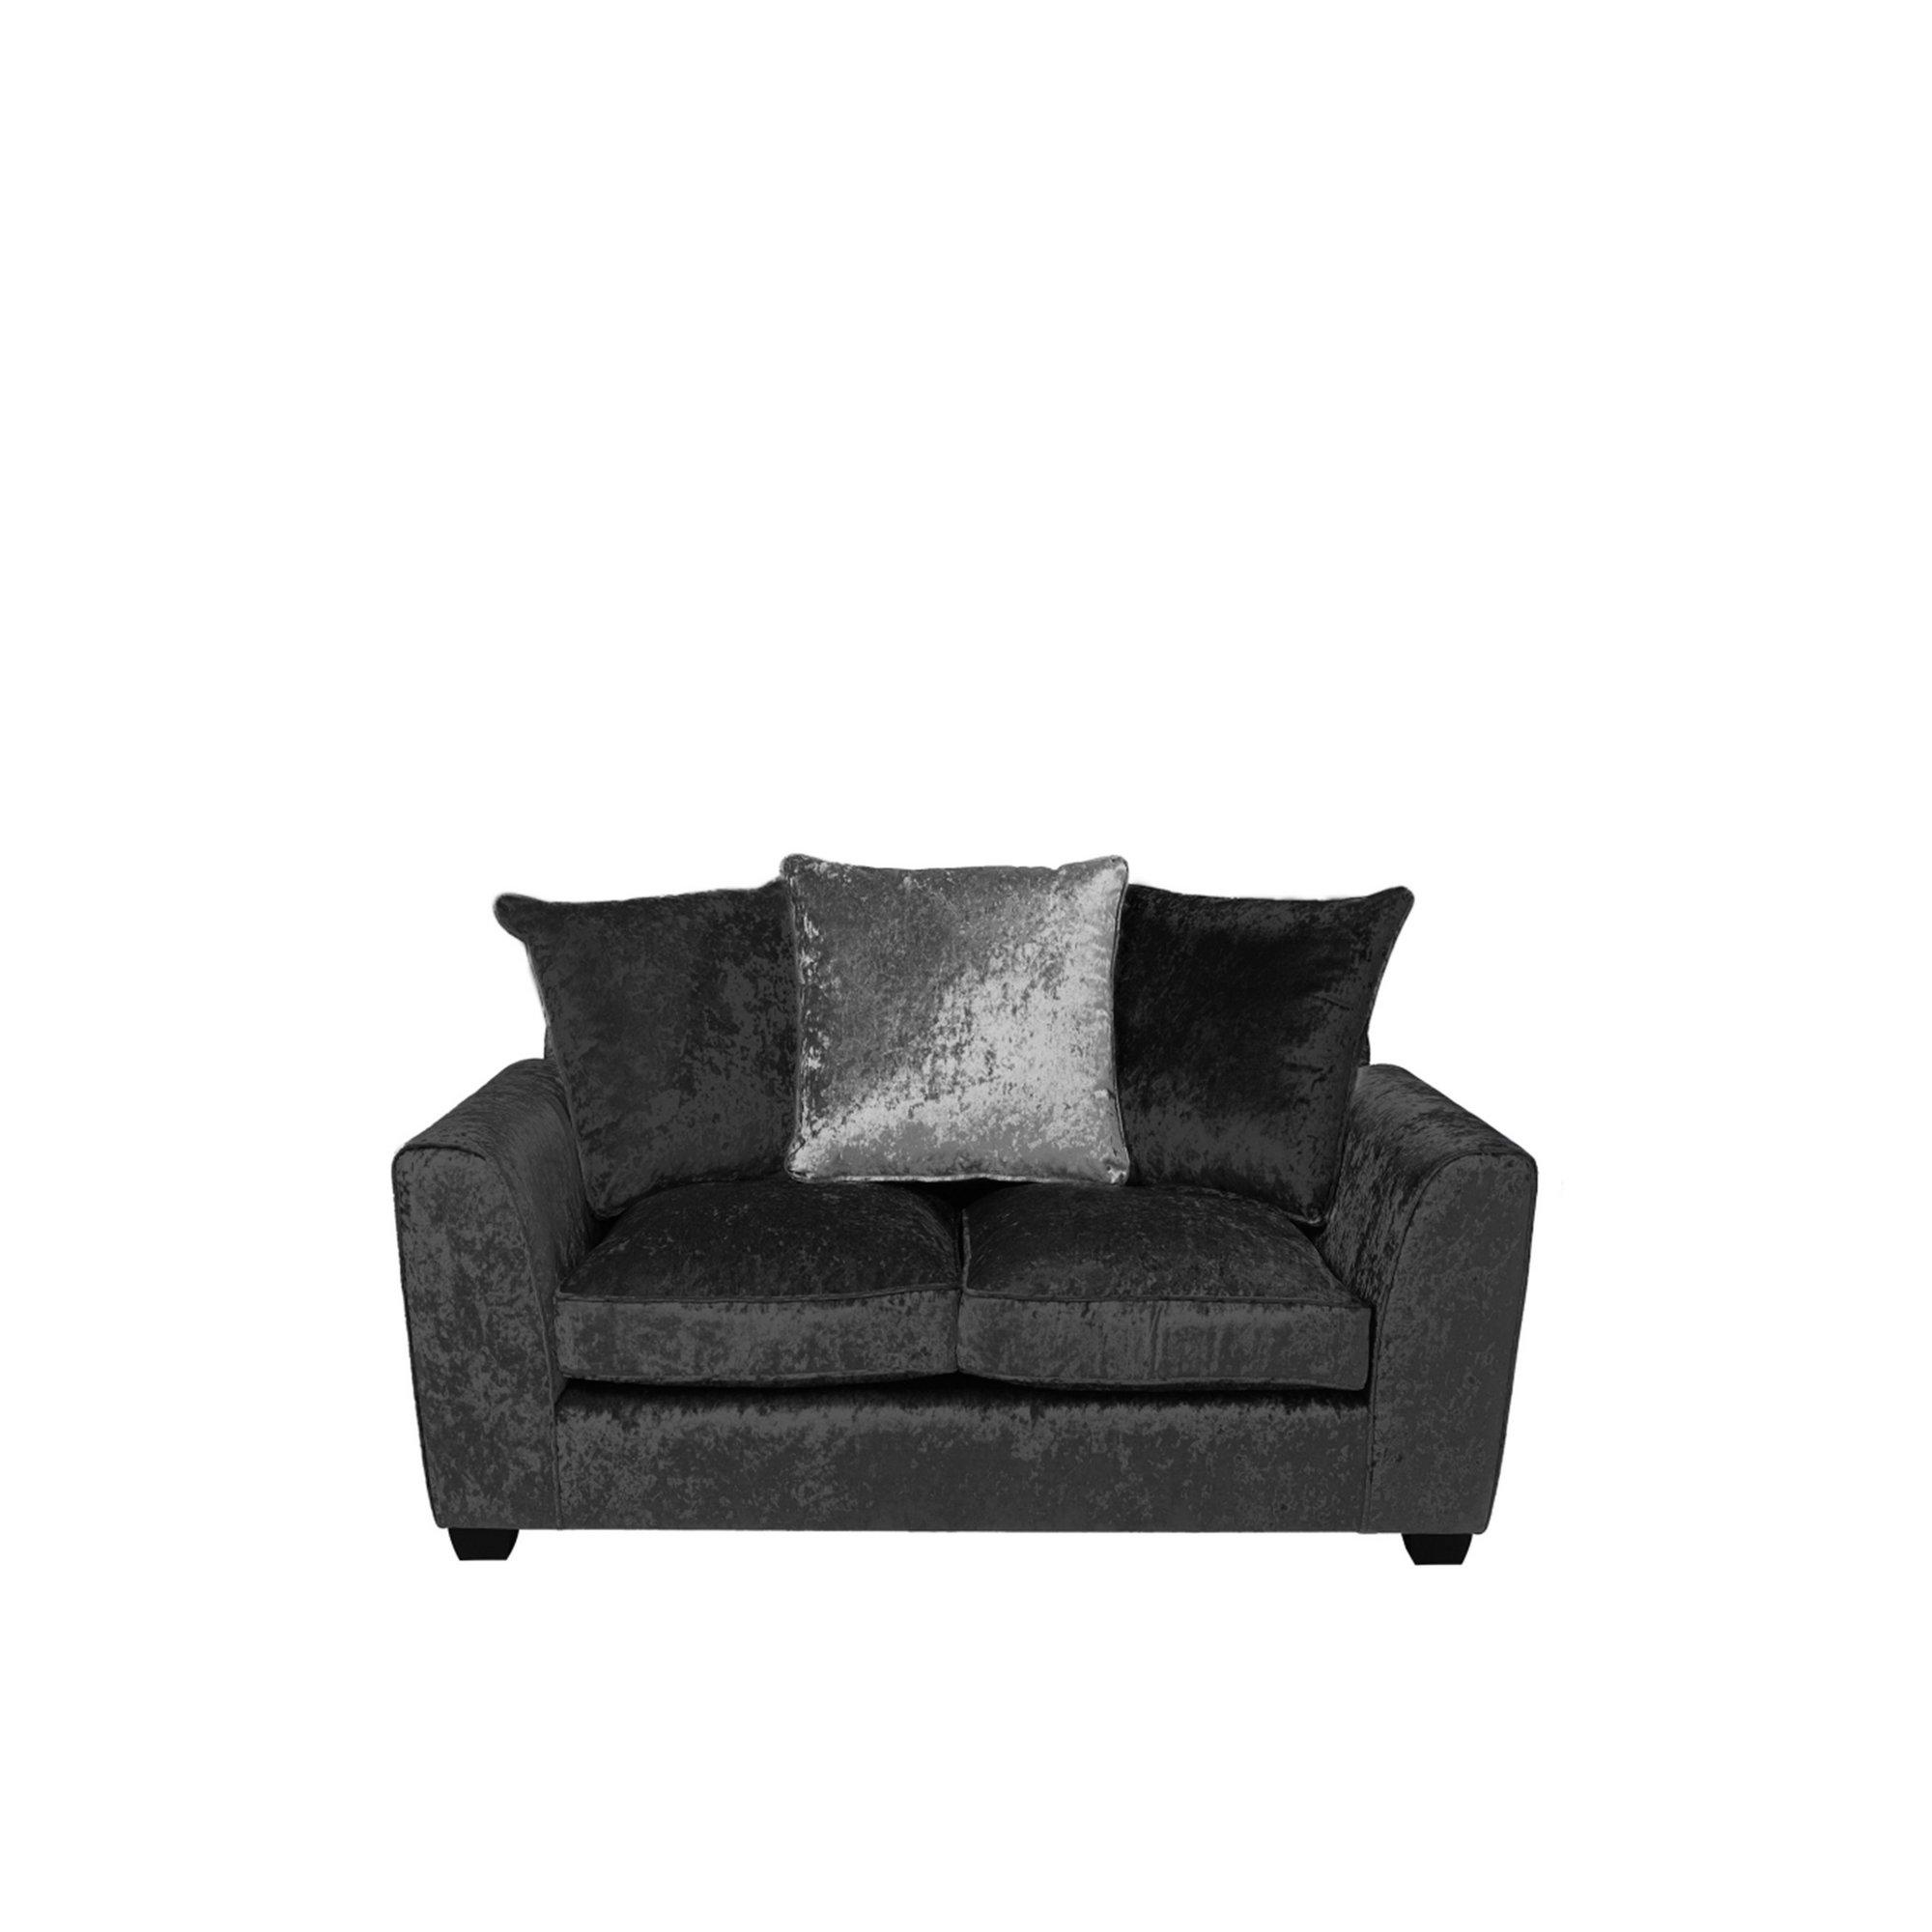 Image of Akira 2 Seater Sofa